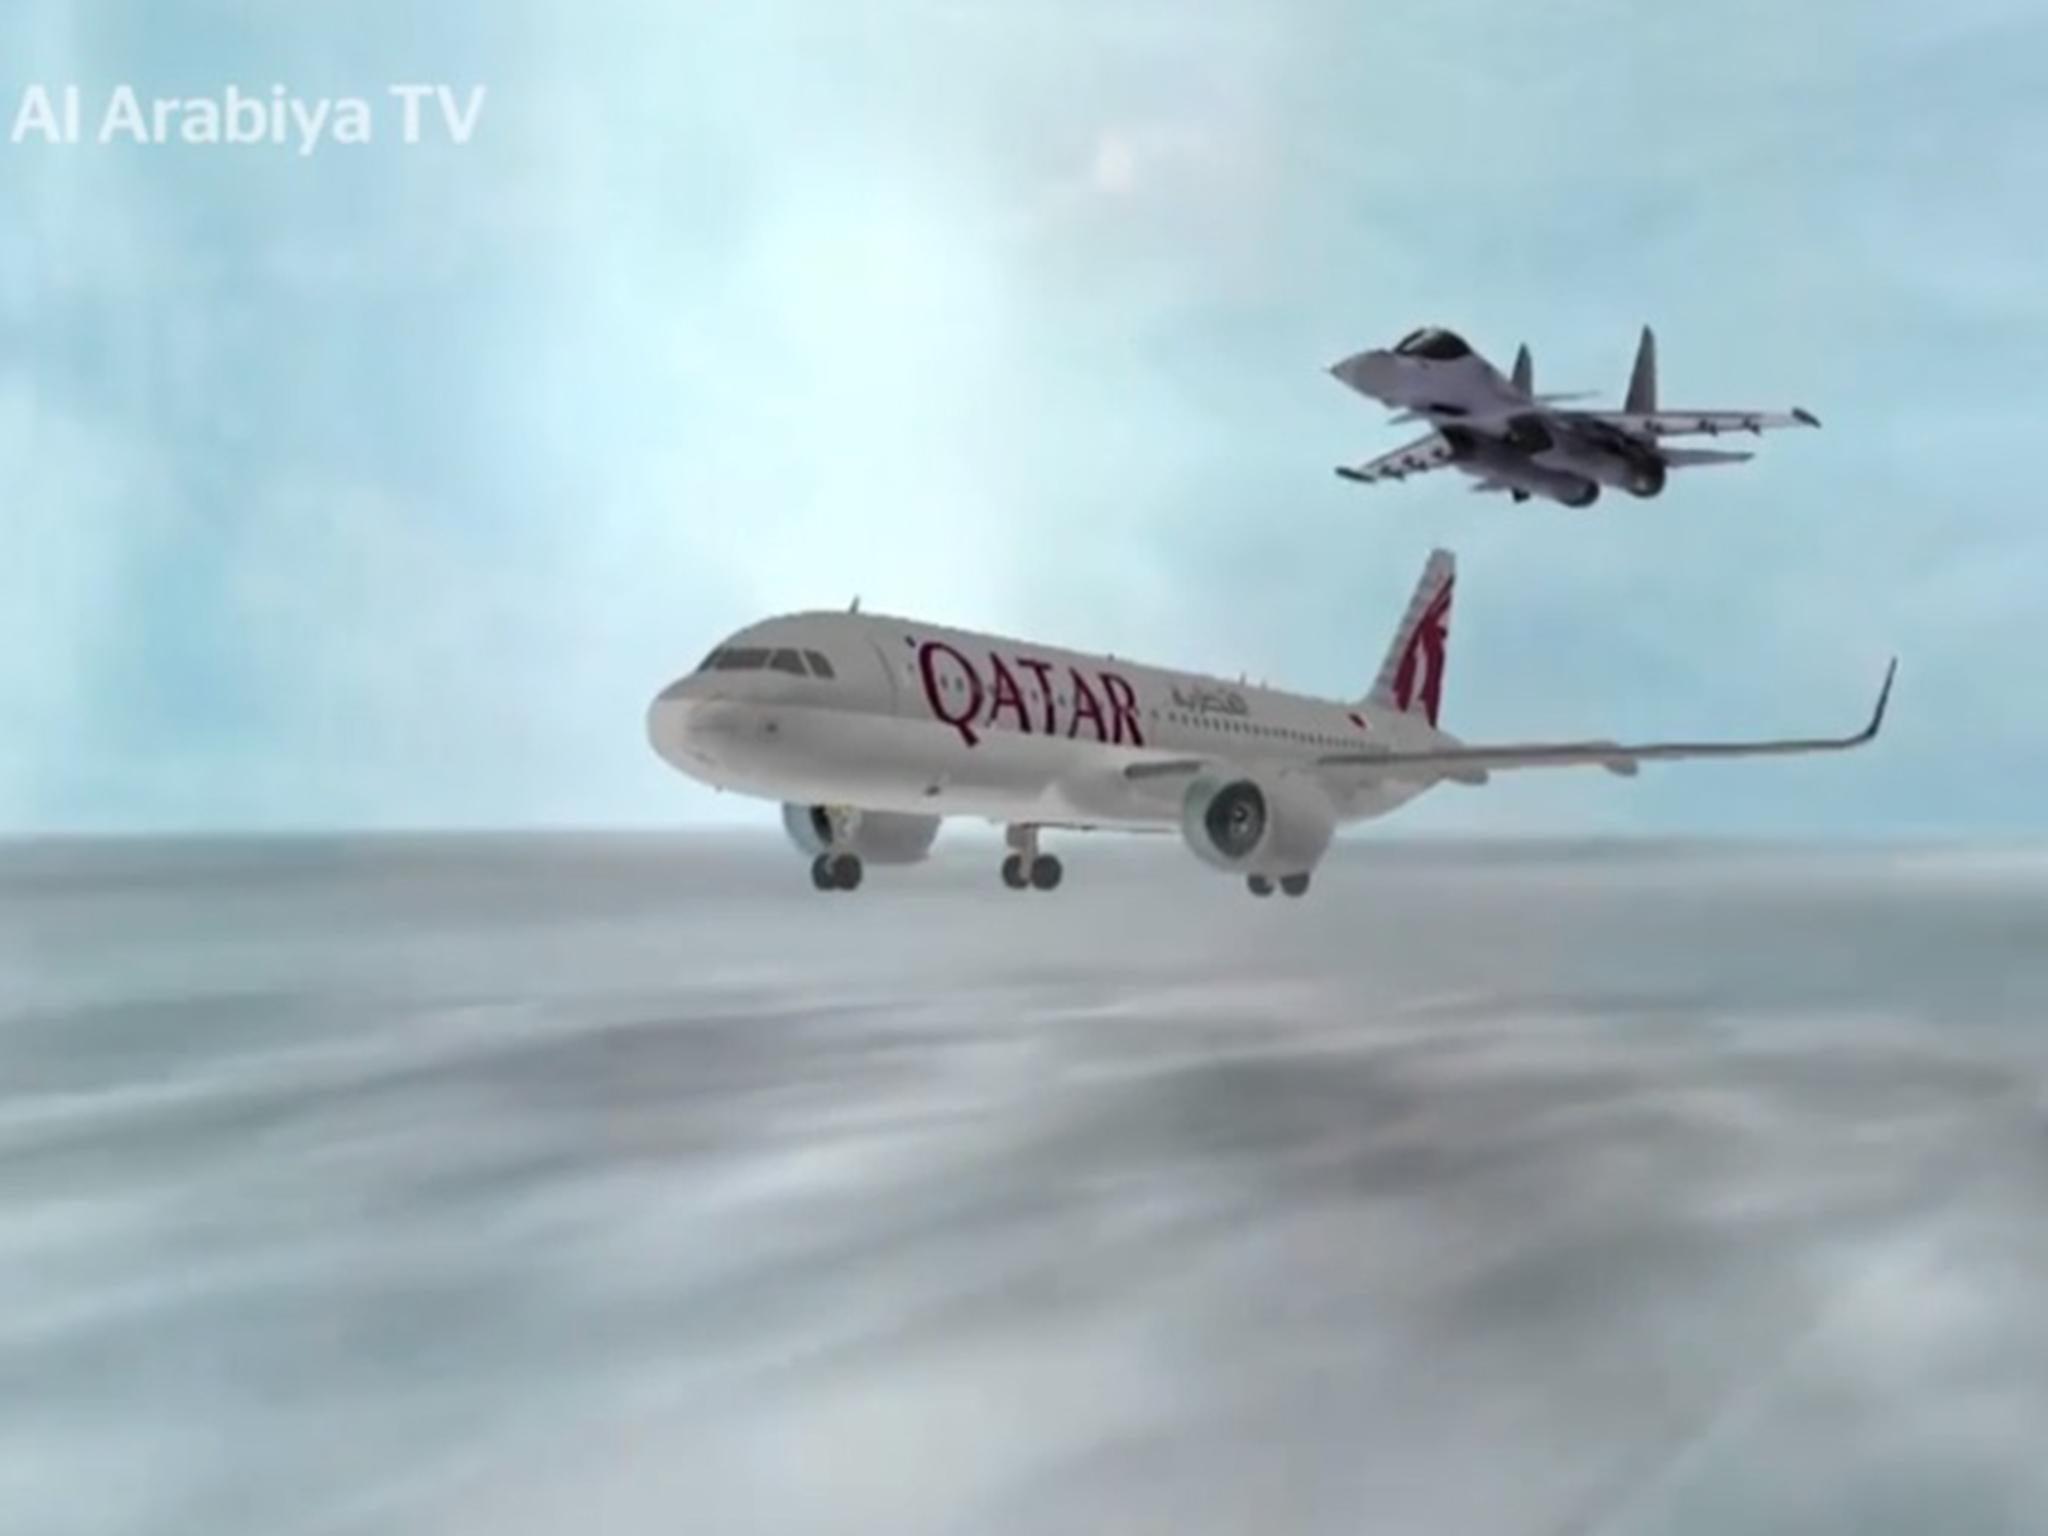 Fears grow as video shows Saudi fighter jet firing missile at a Qatari civilian aircraft